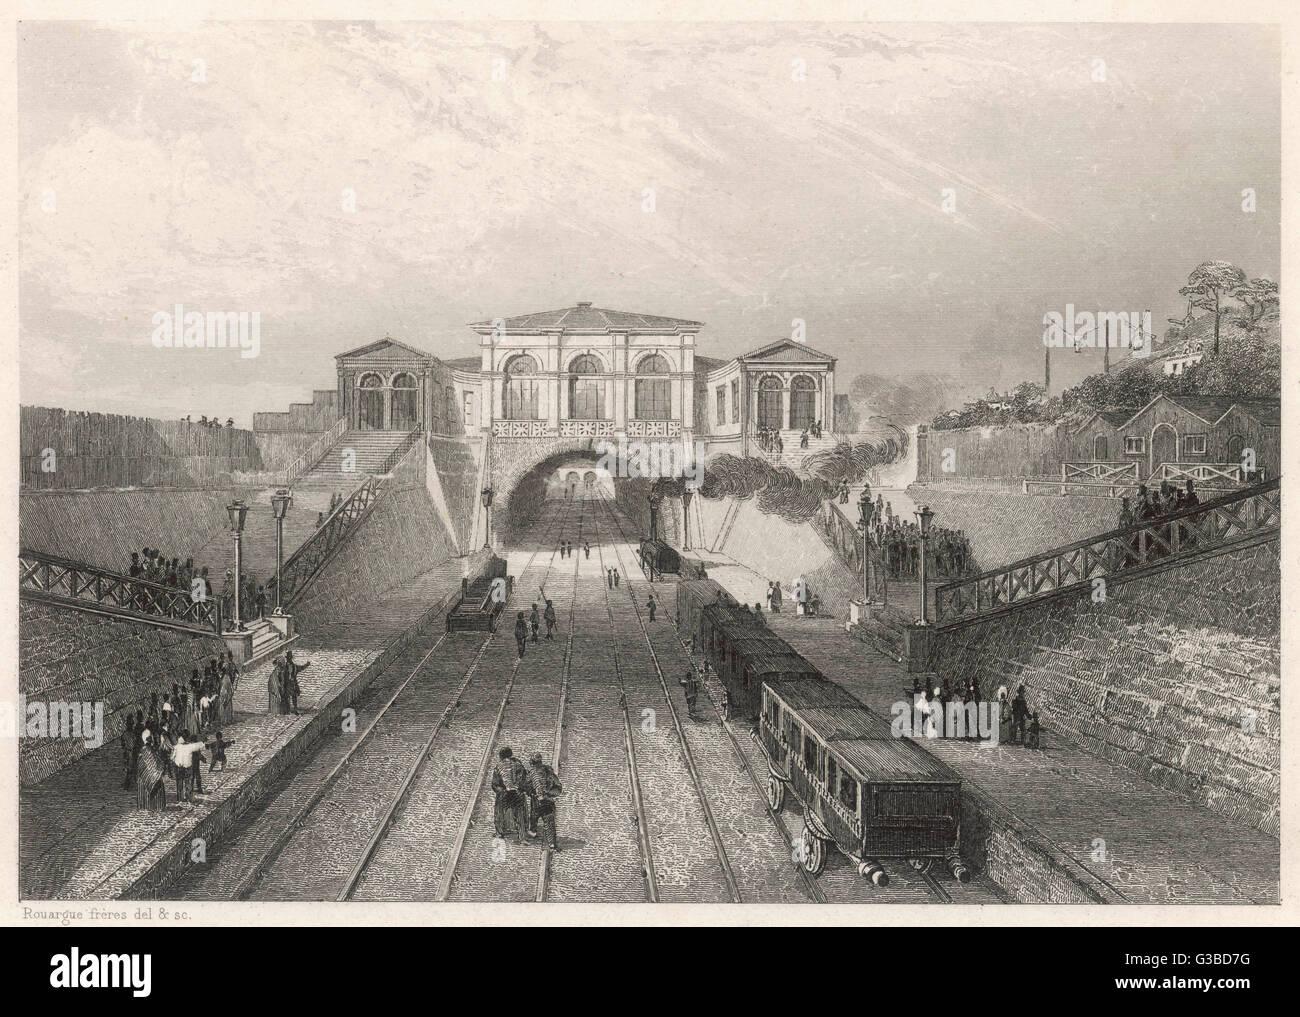 Scene on the 'Rothschild' line  linking Paris and Saint- Germain.       Date: 1837 - Stock Image